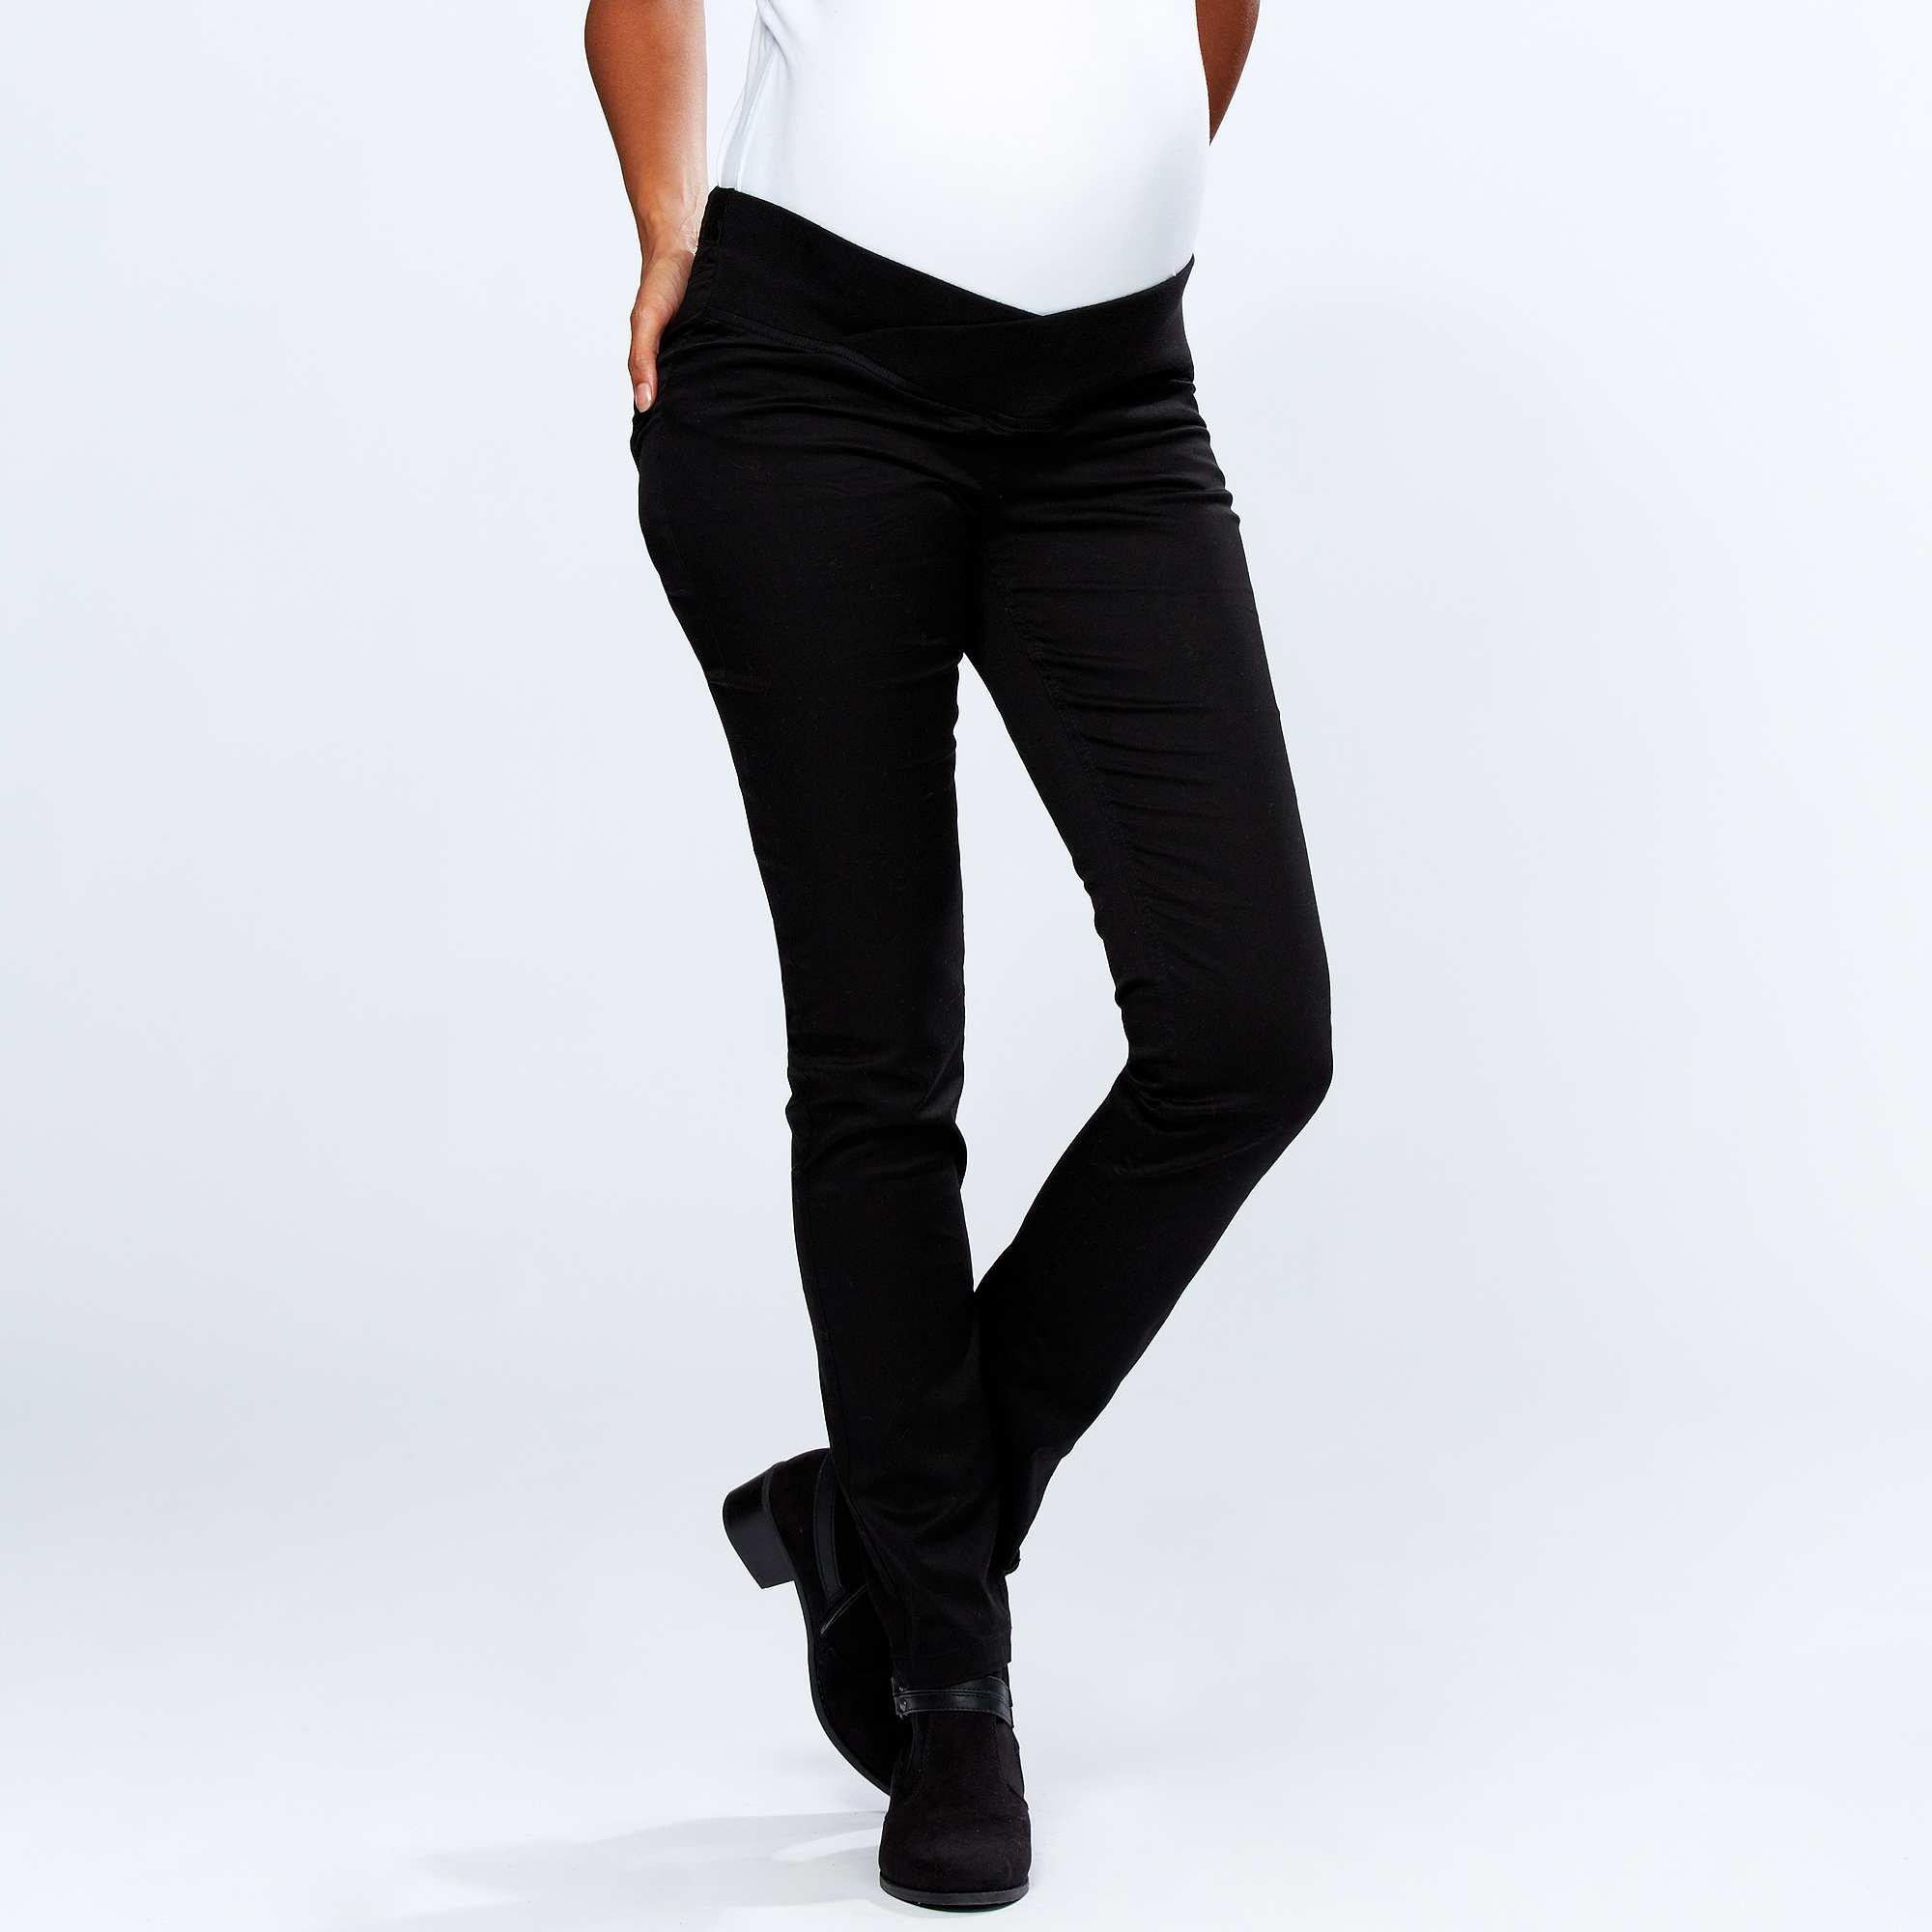 Pantalon de grossesse taille basse